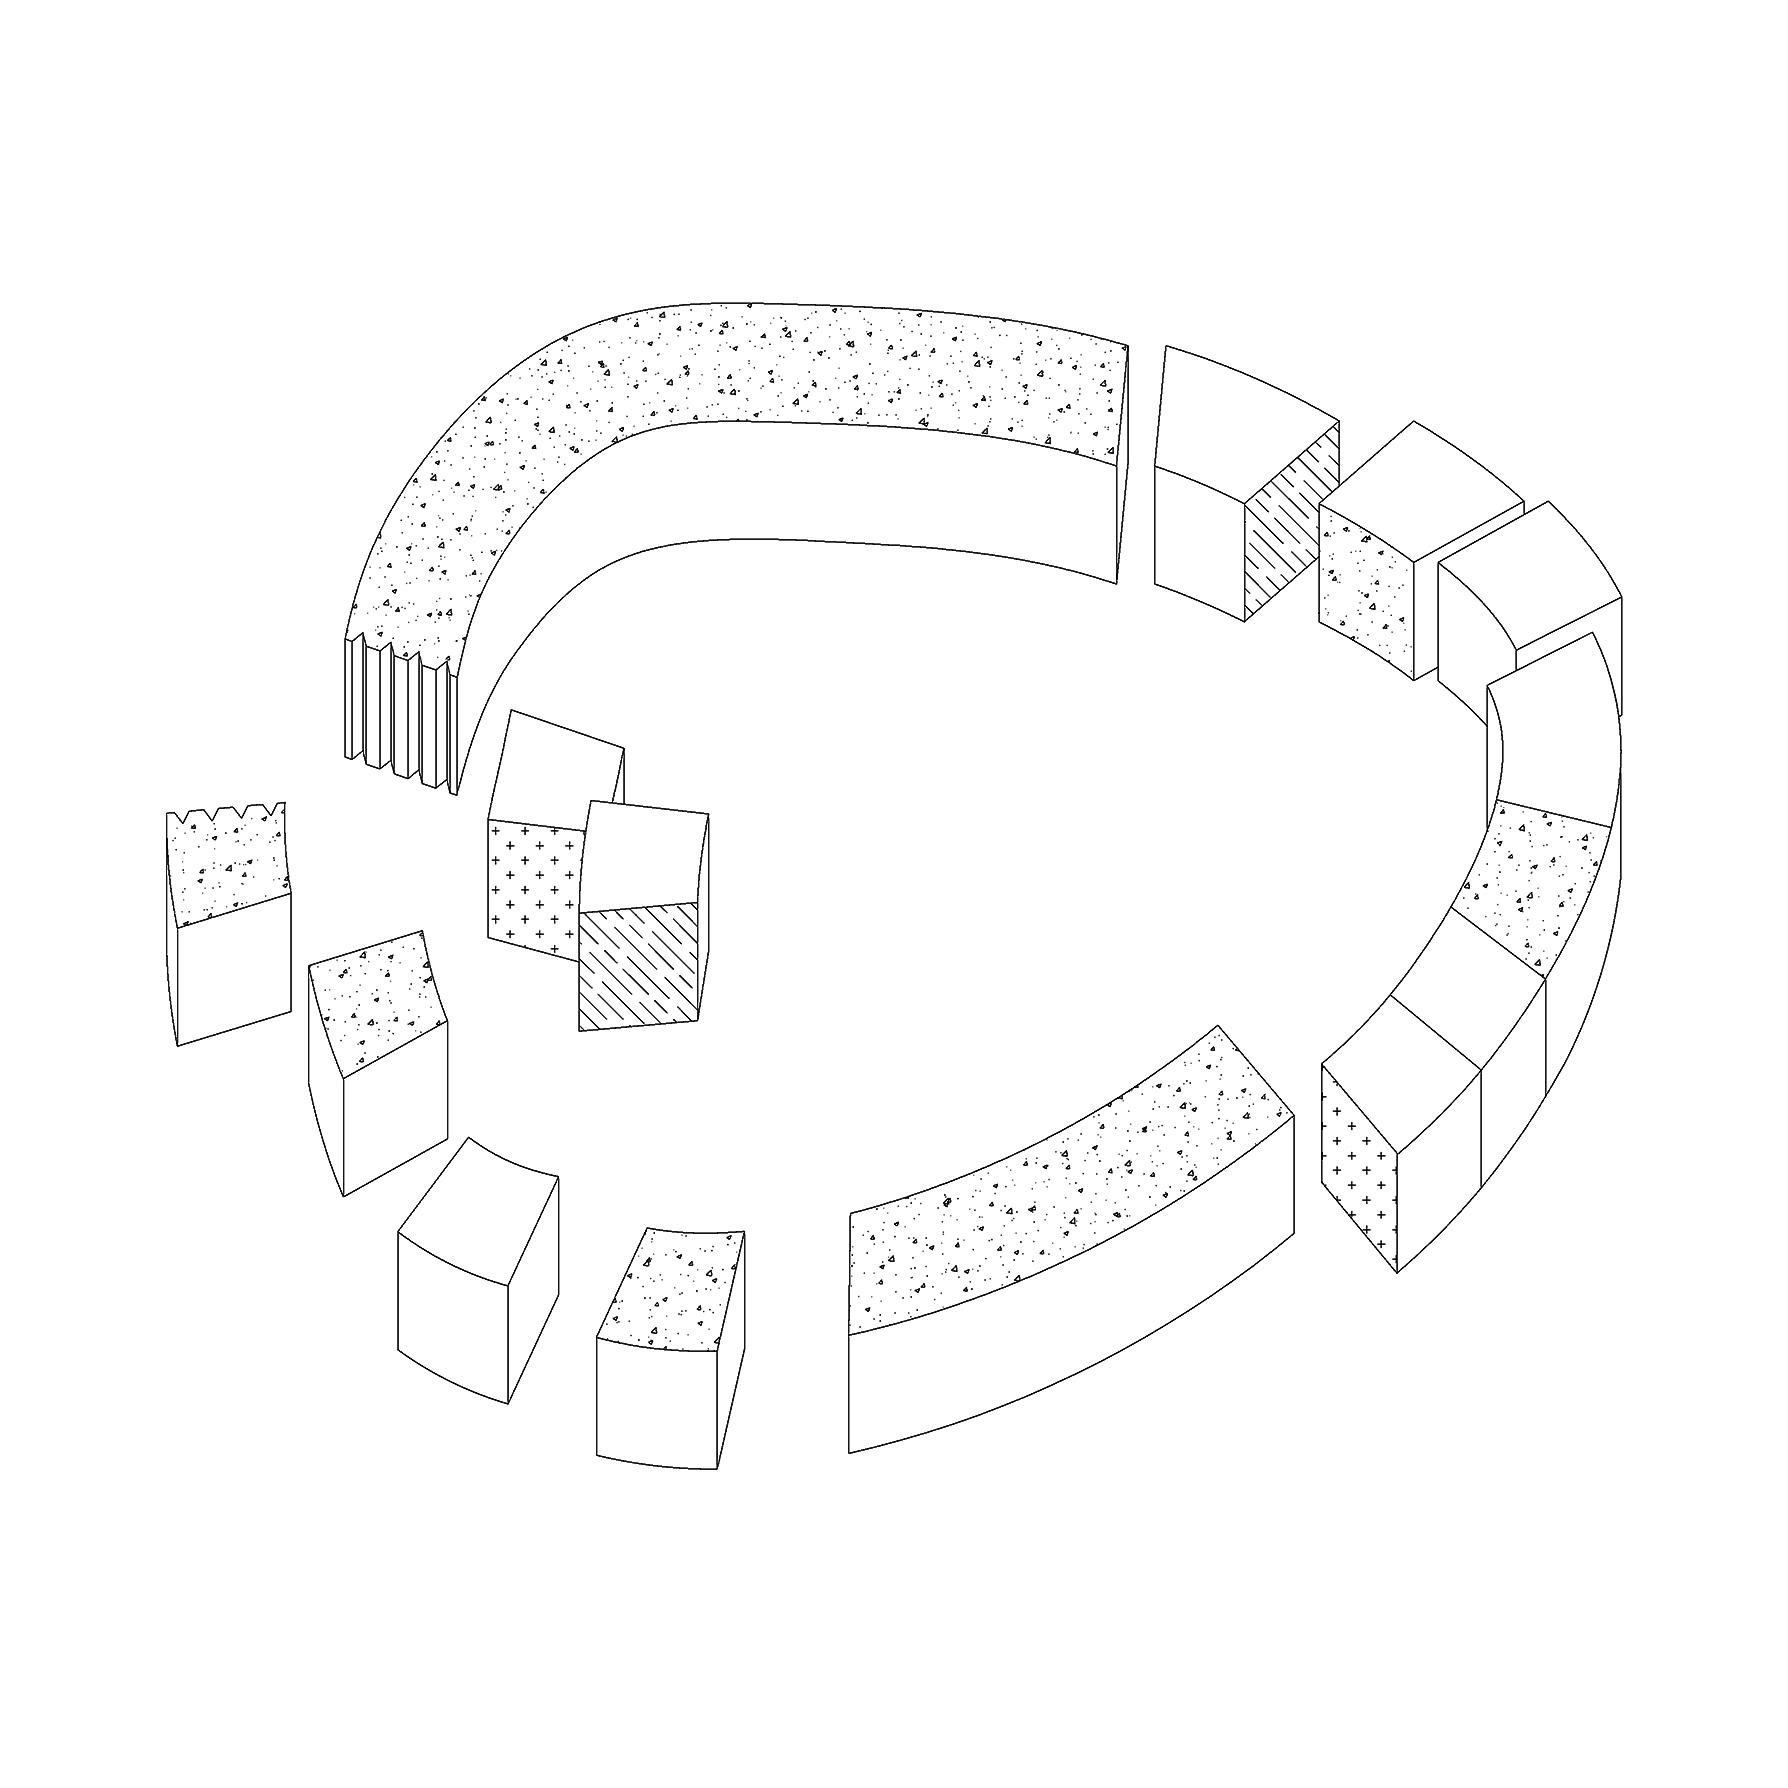 Fabrication Diagram square.jpg